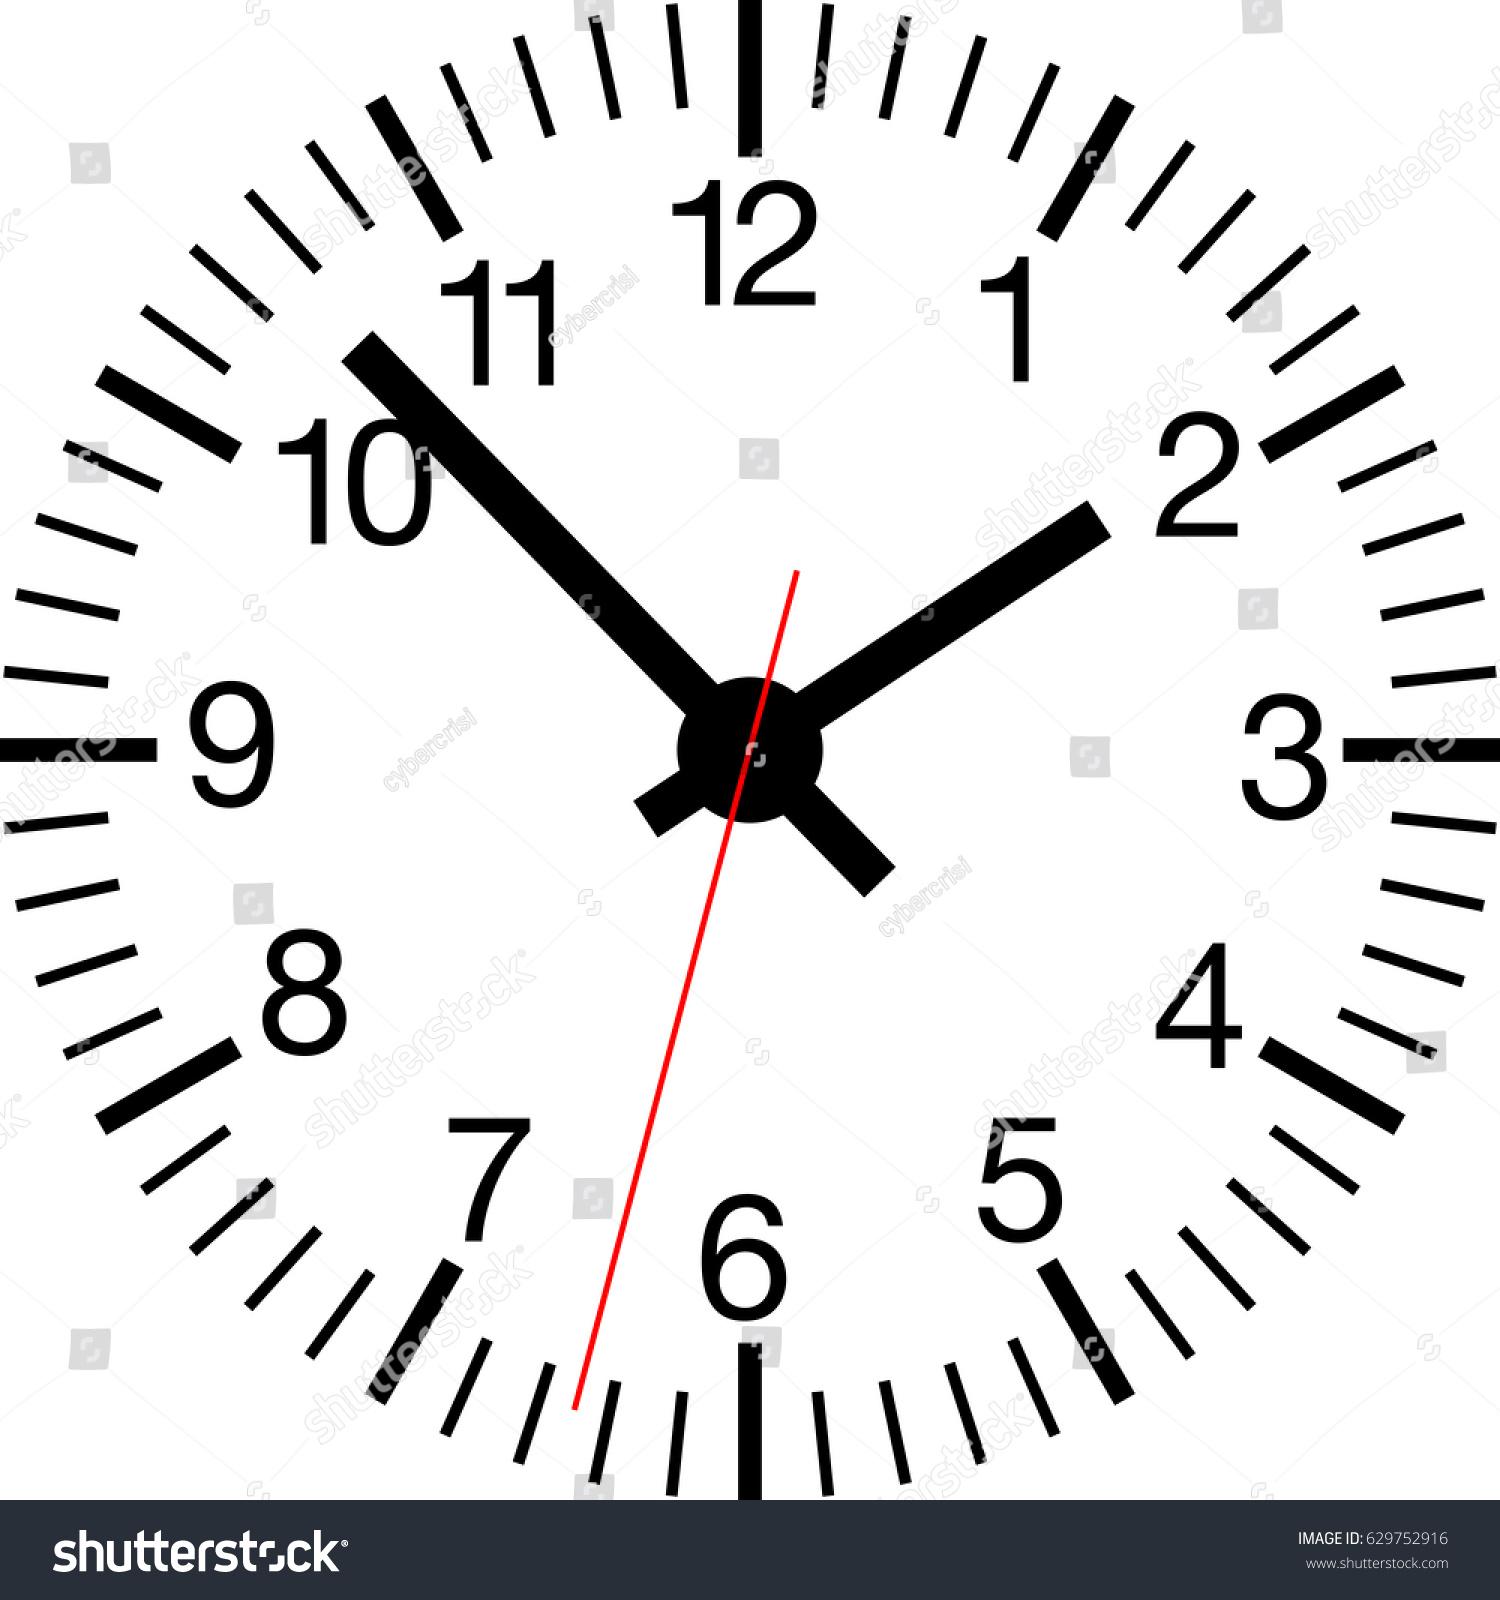 Standard analog clock face wall clock stock vector 629752916 standard analog clock face of a wall clock amipublicfo Gallery